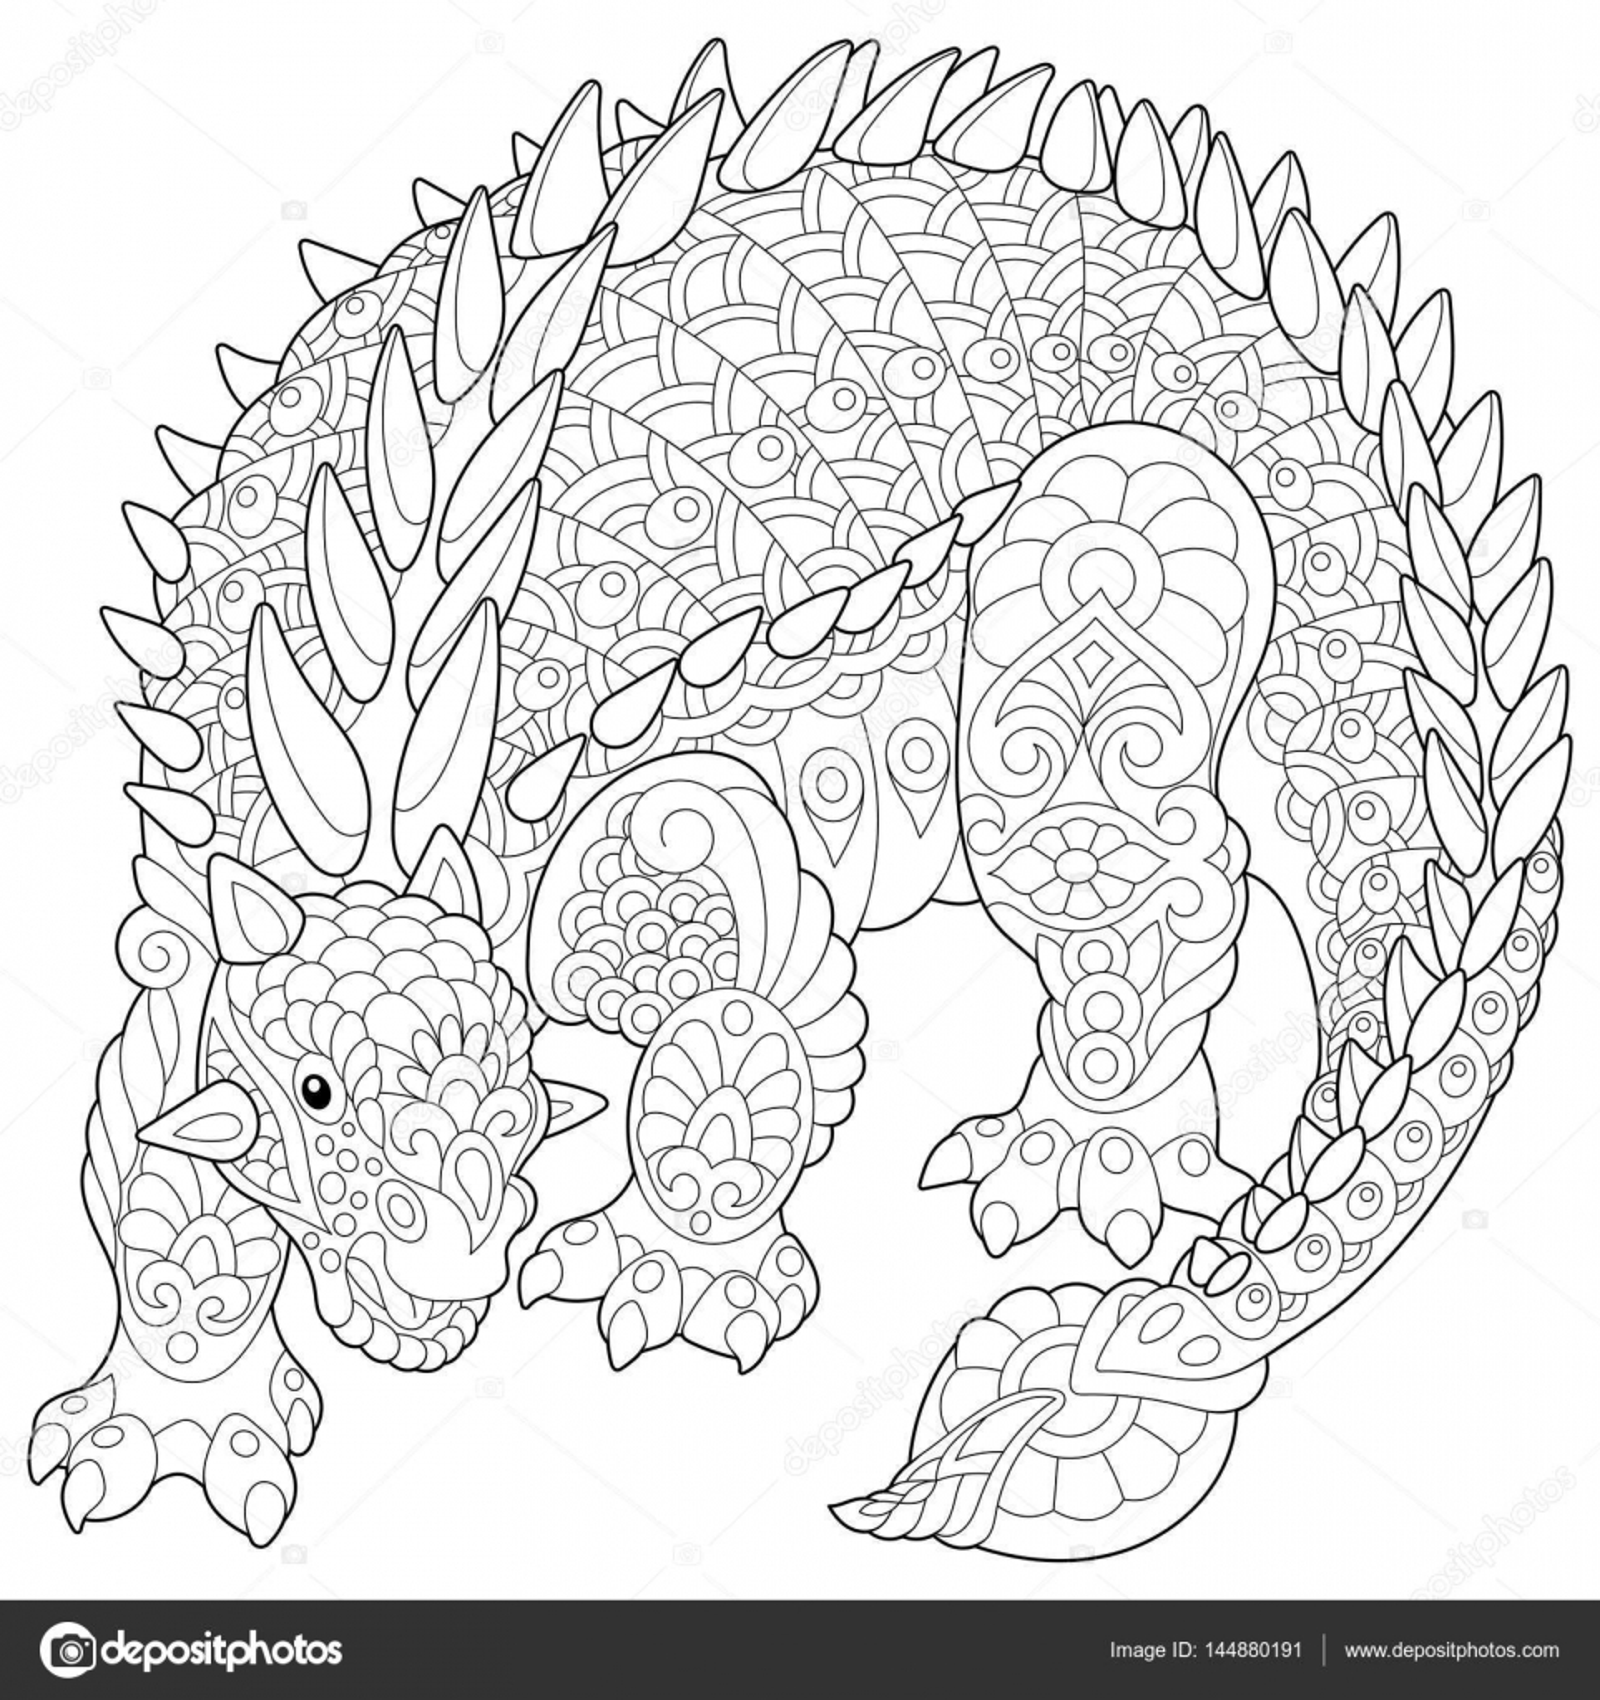 Zentangle anquilosaurio dinosaurio archivo im genes - Mandala dinosaure ...